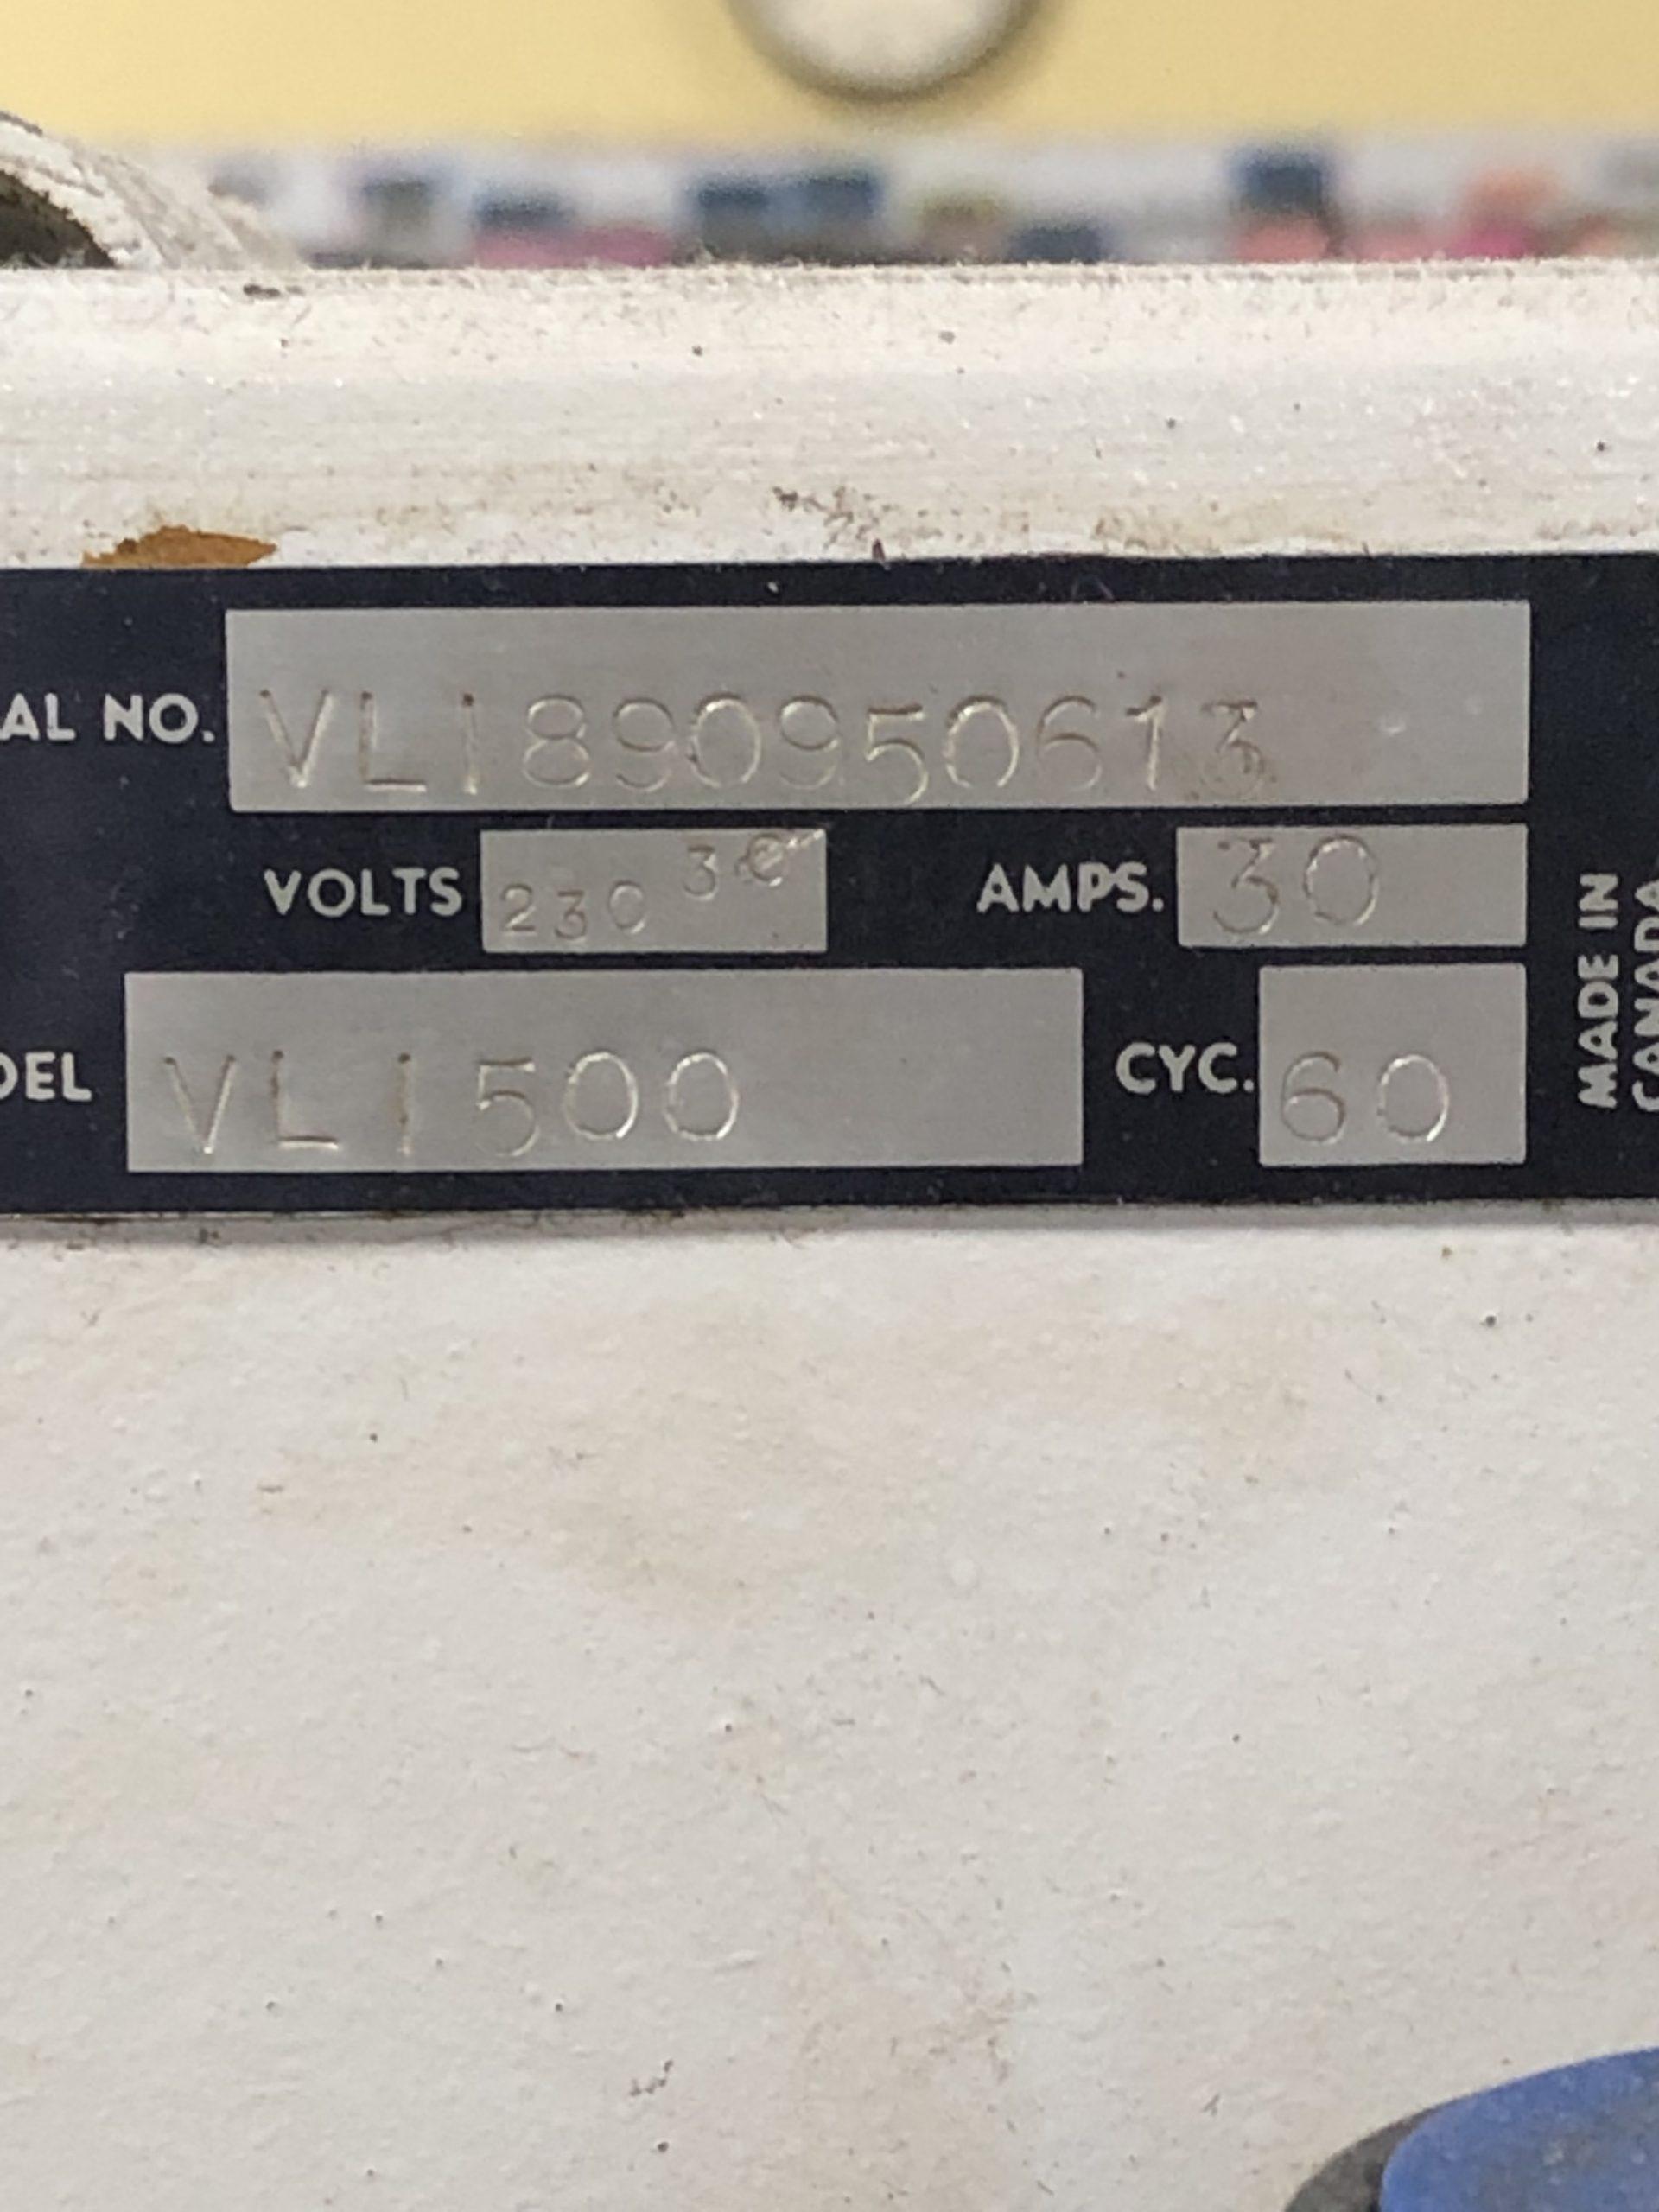 Rotoflex VLI500 - Used Flexo Printing Presses and Used Flexographic Equipment-4